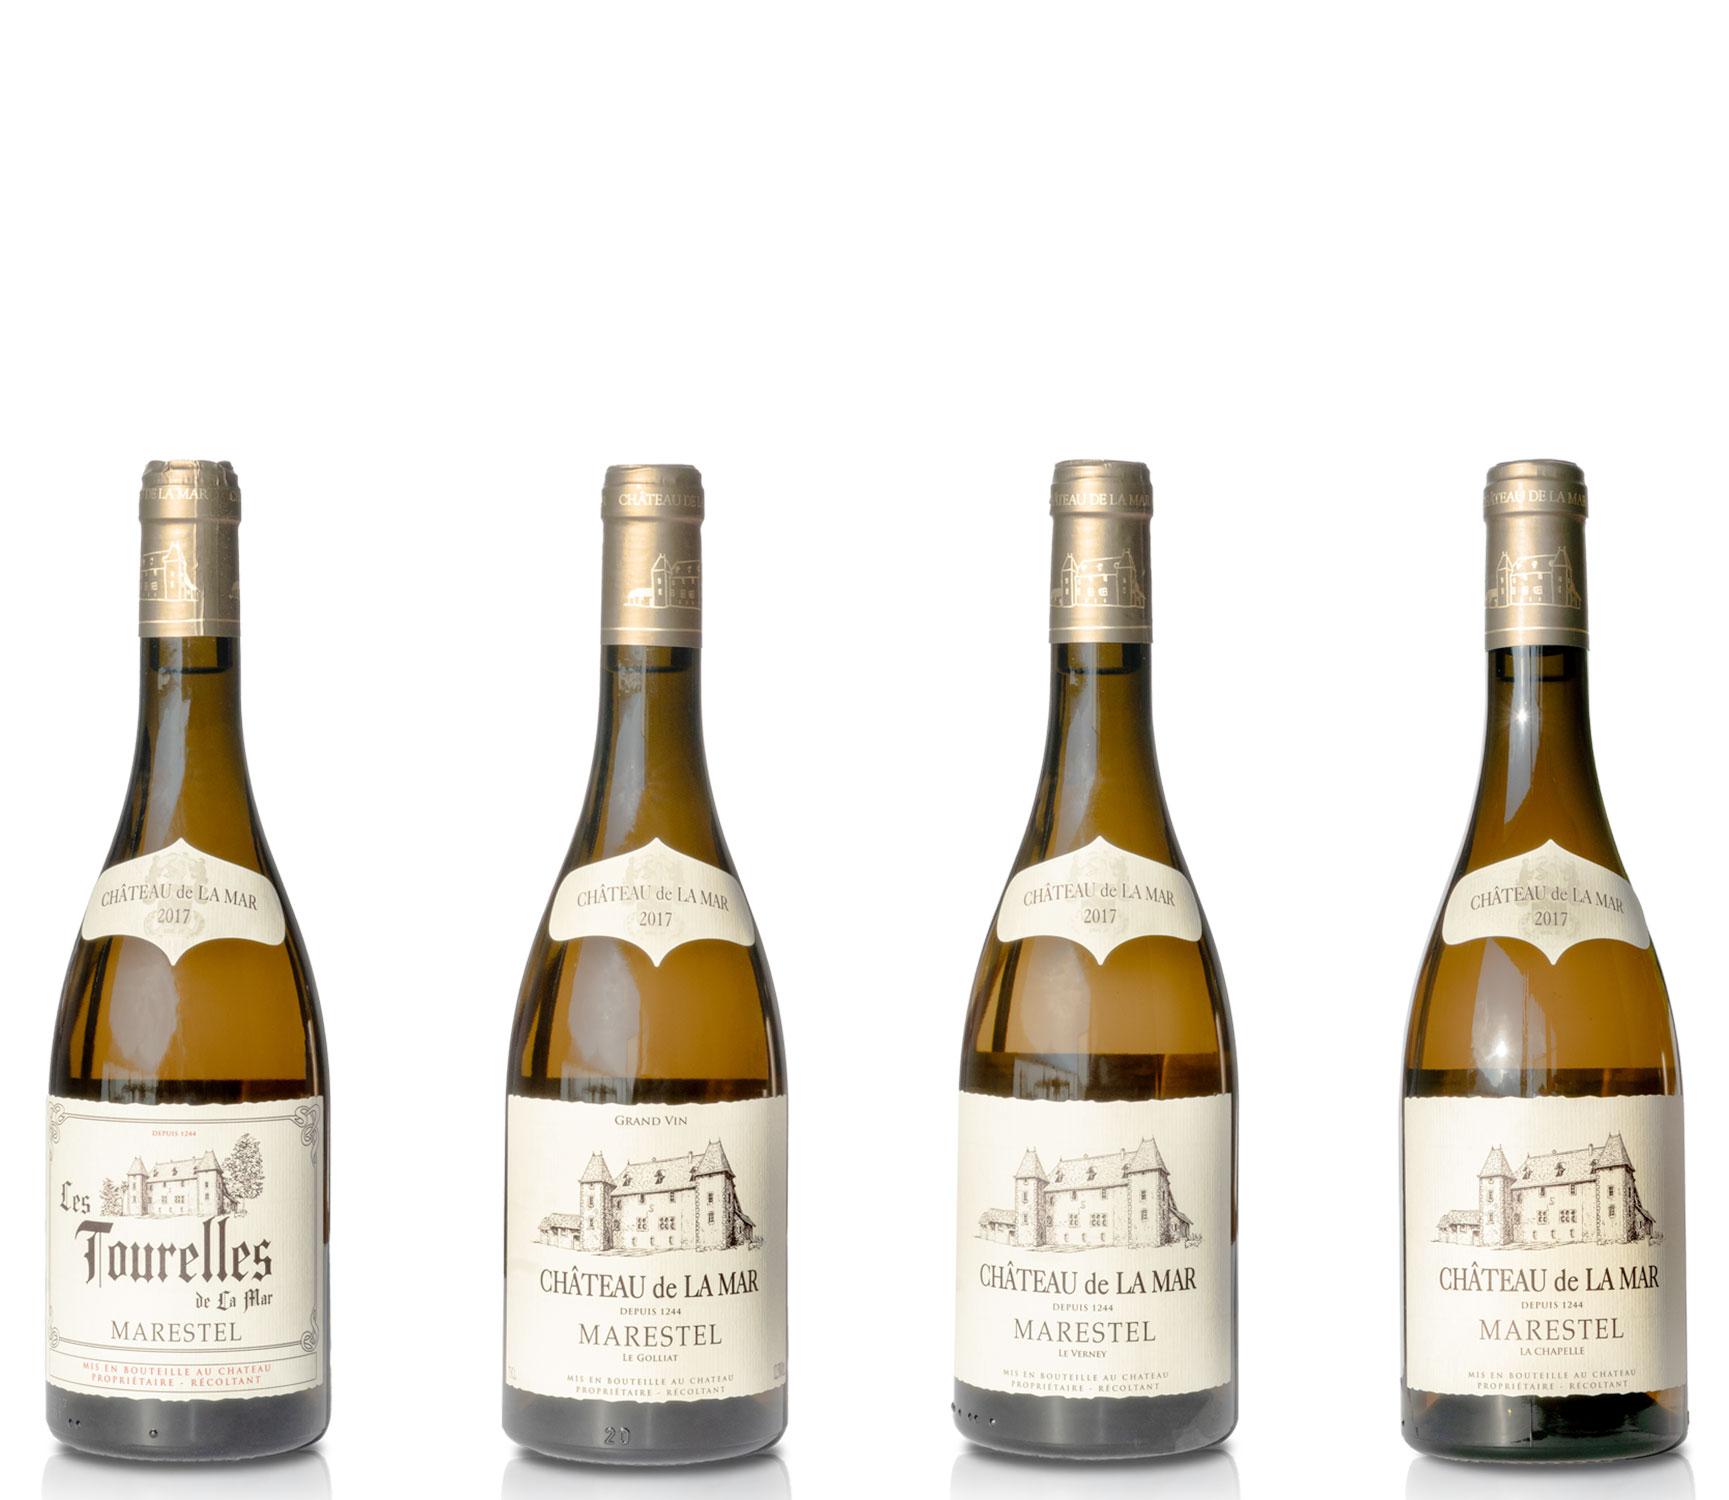 Vins blancs de Savoie - Clos Marestel